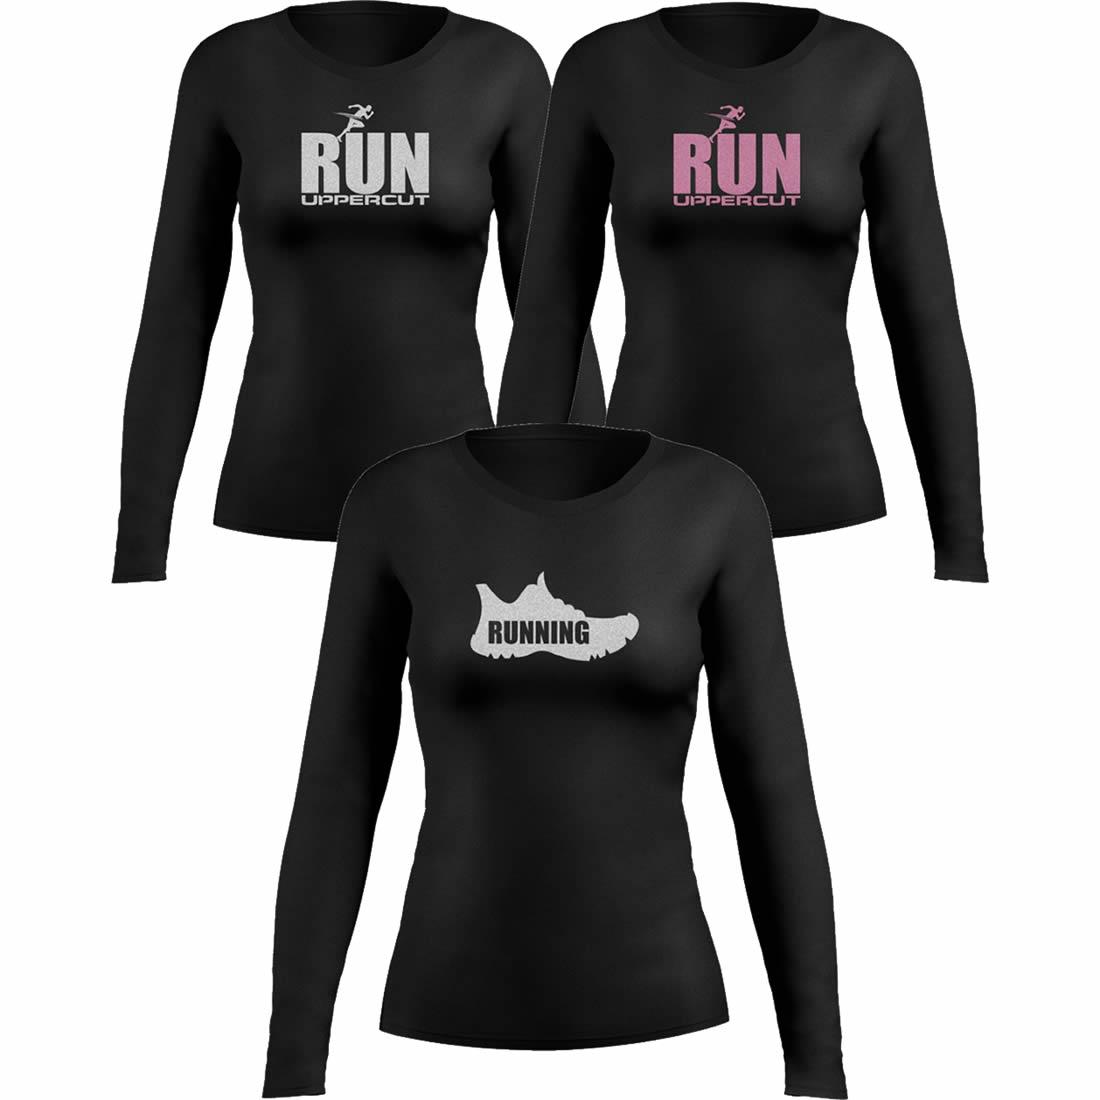 Kit 3 Camisas UV-50+ - Corrida Running Feminina - Kt15